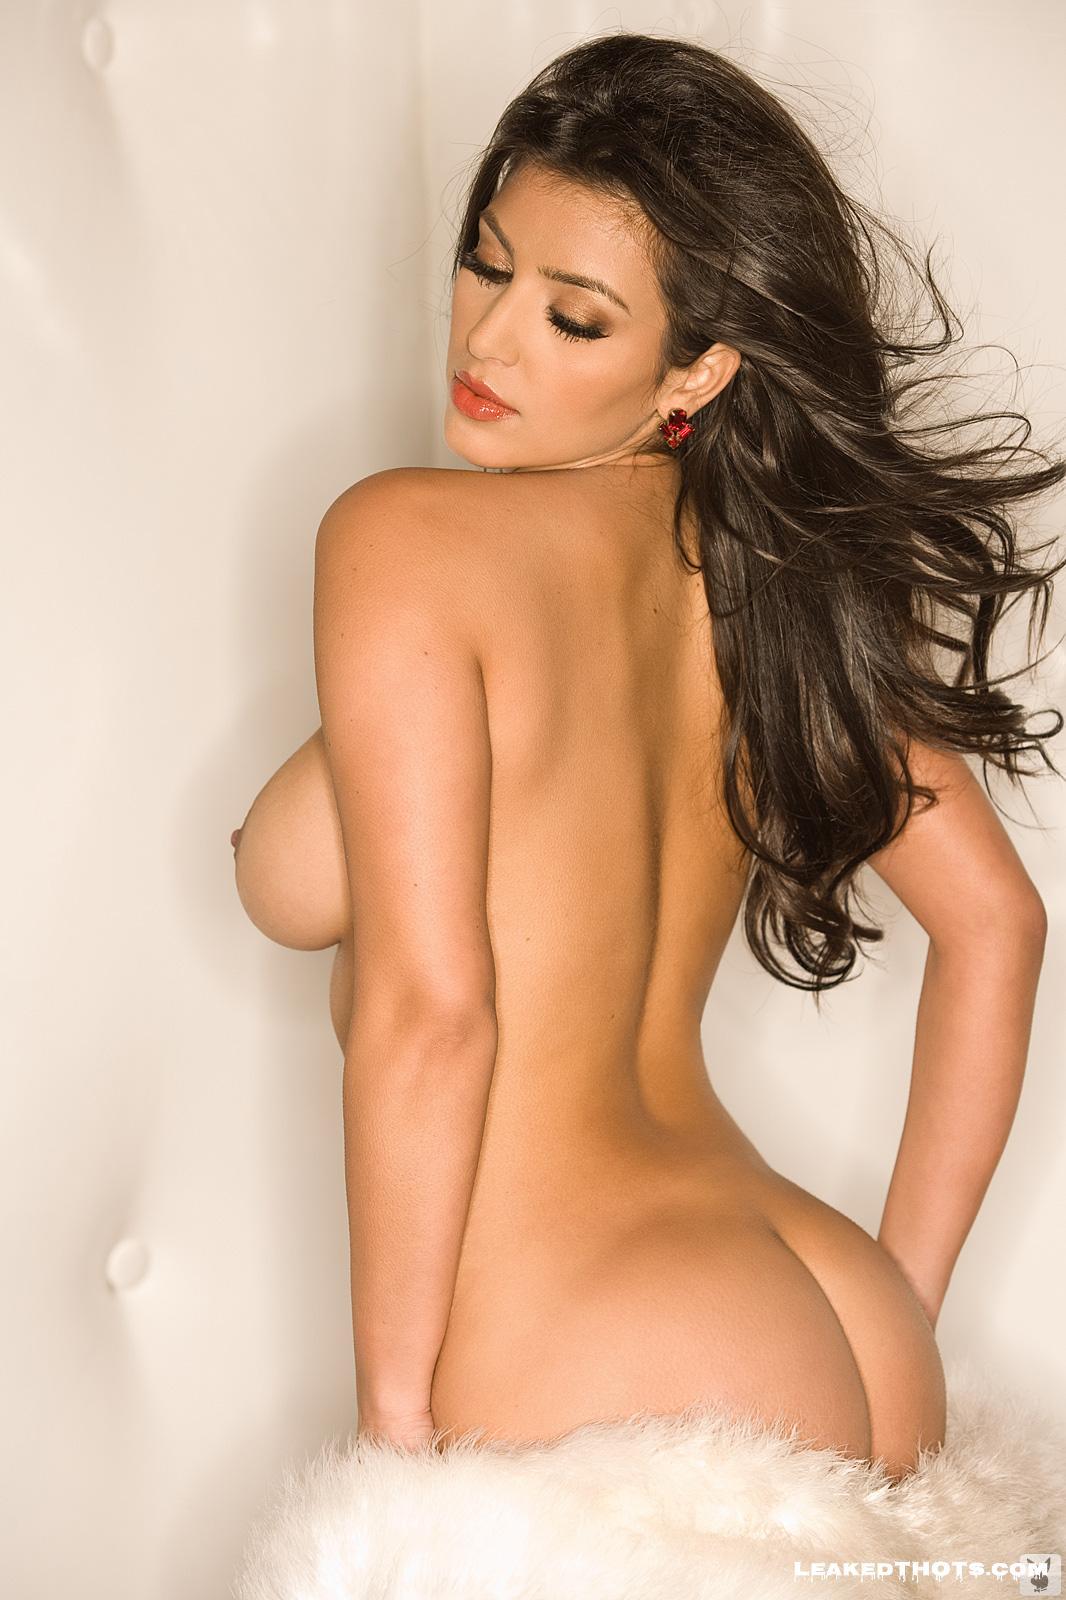 Kim Kardashian | LeakedThots 22